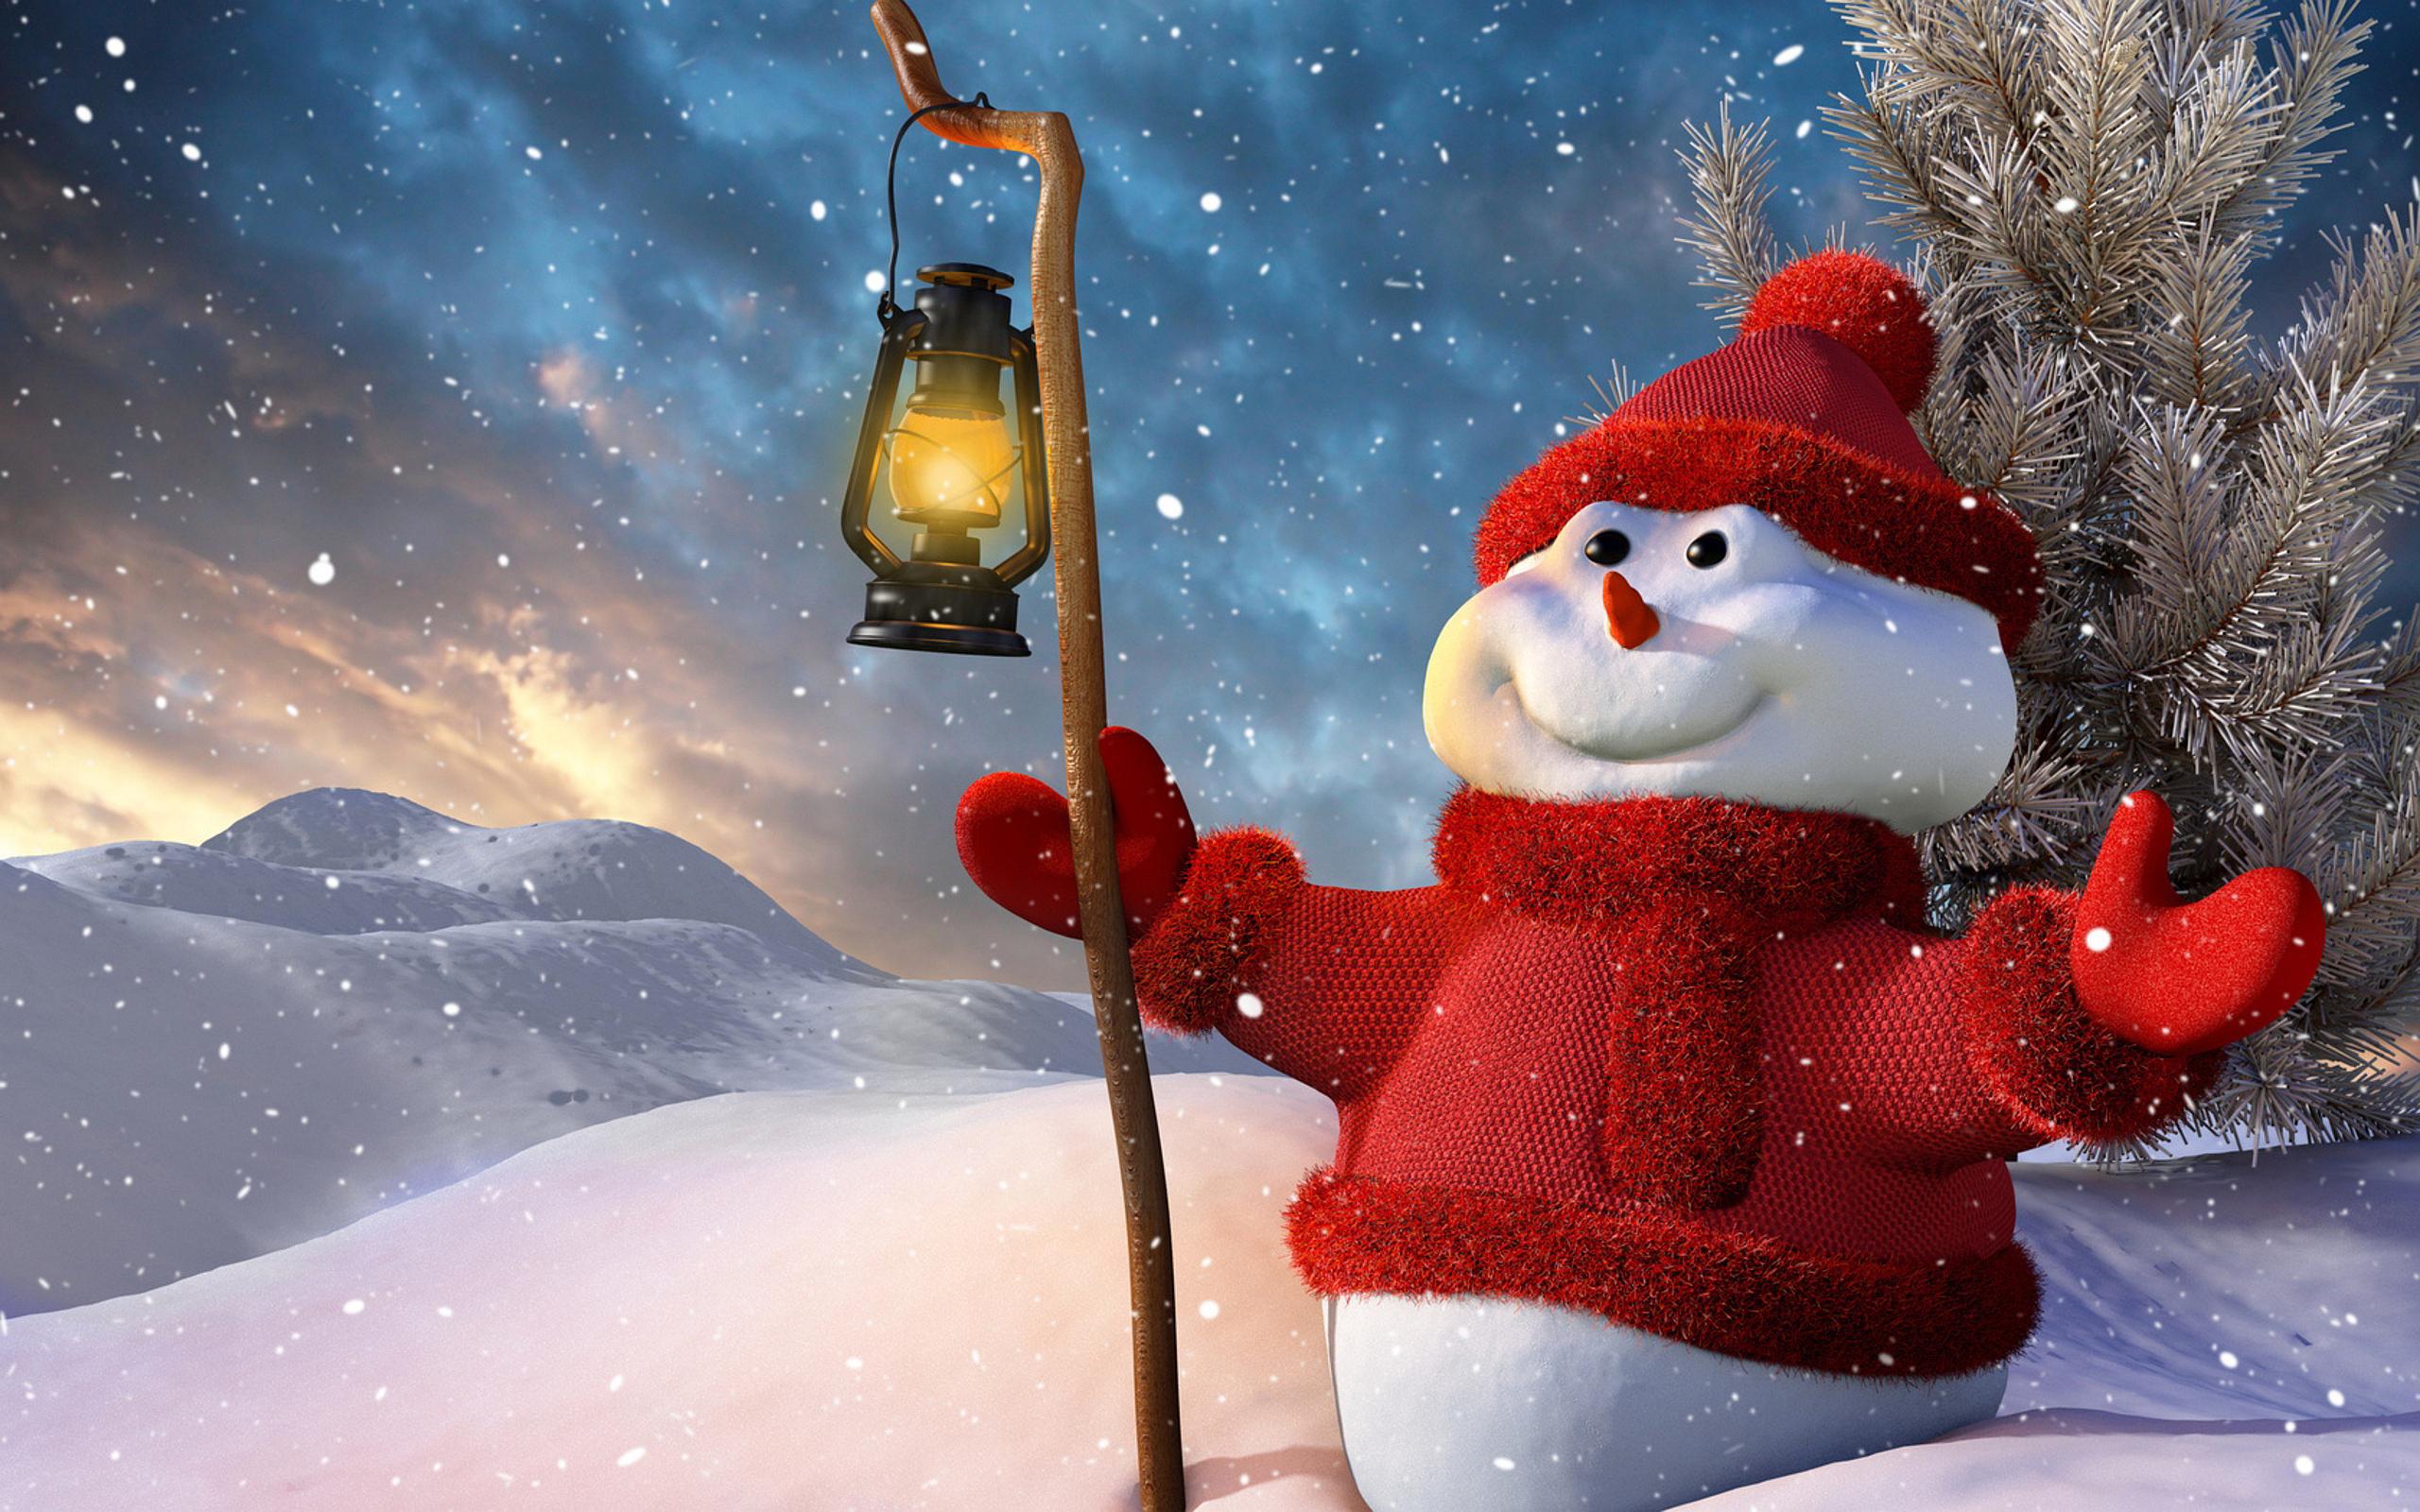 snowman wallpaper background 52517